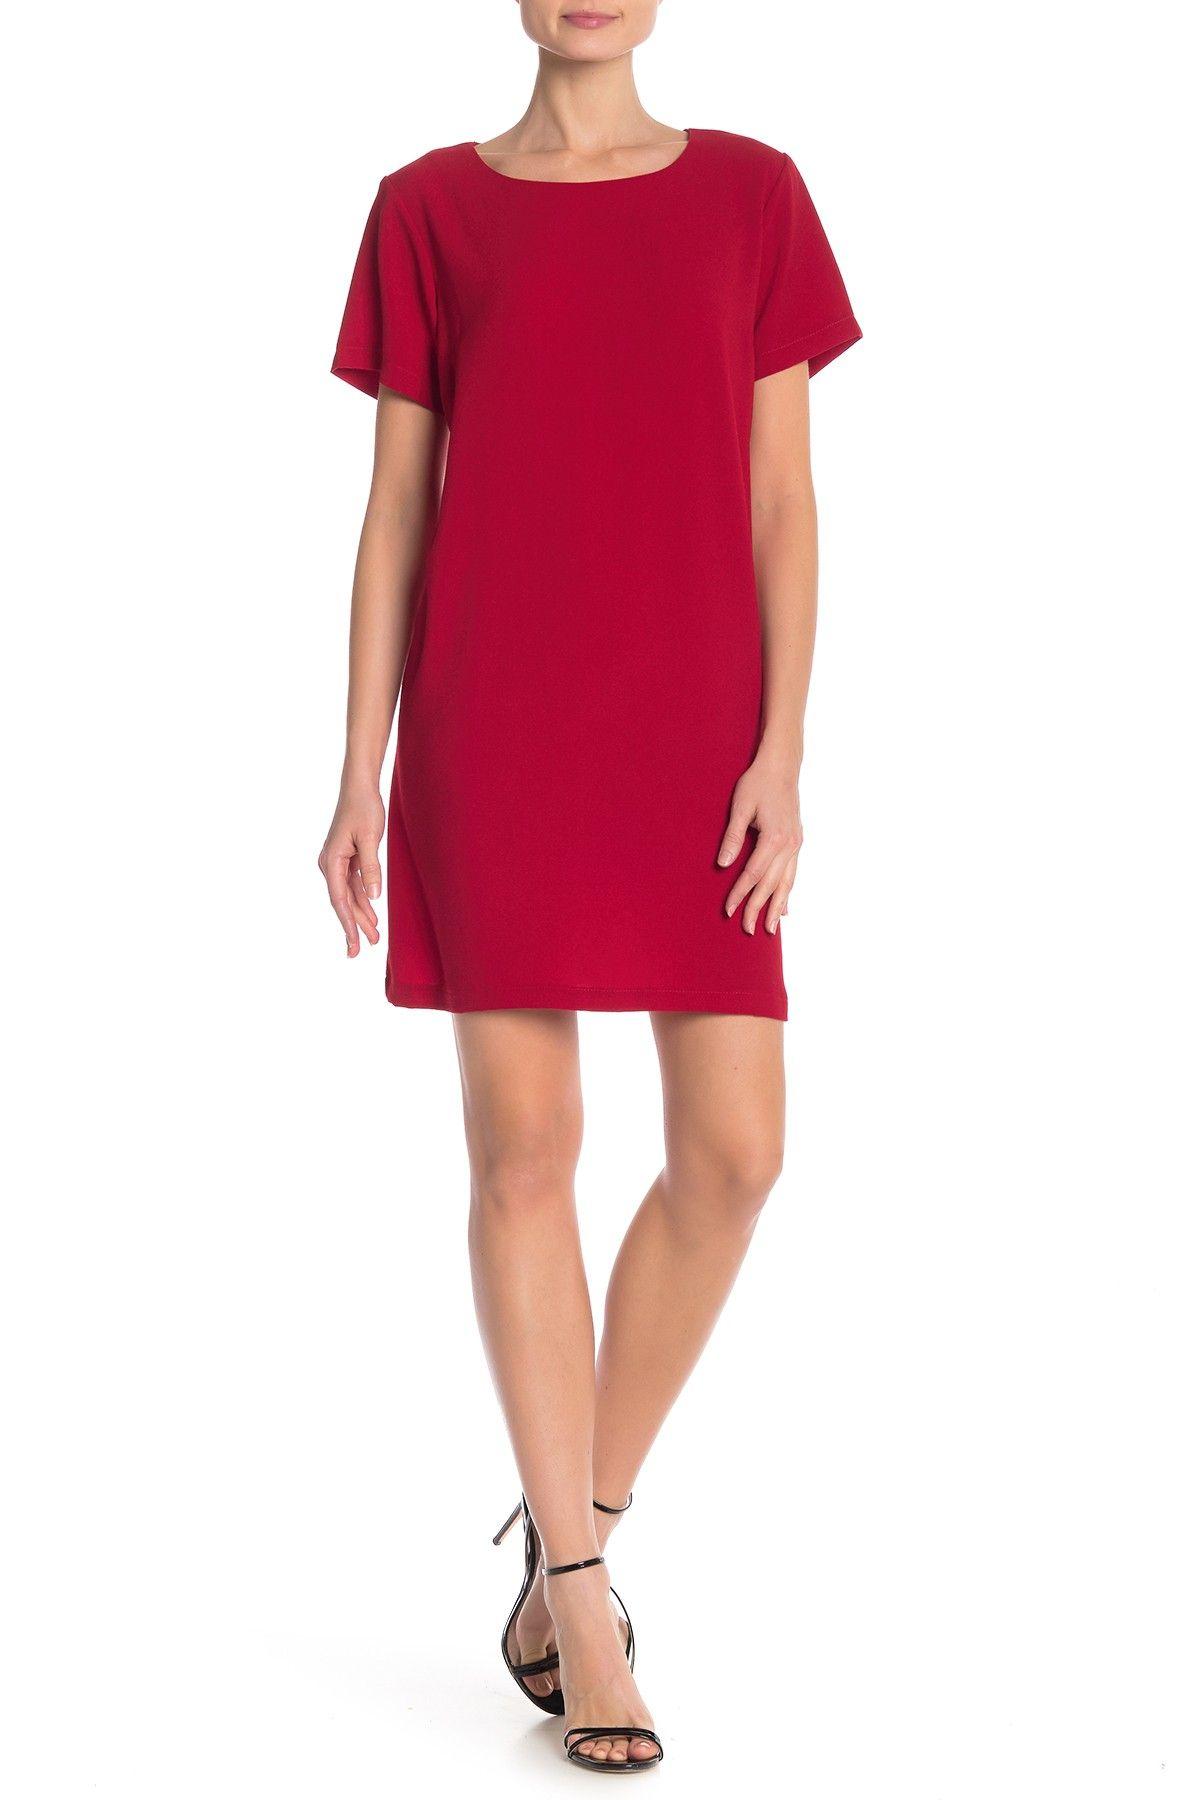 Bobeau Short Sleeve Crepe Shift Dress Nordstrom Rack Shift Dress Short Sleeve Shift Dress Short Dresses Casual [ 1800 x 1200 Pixel ]